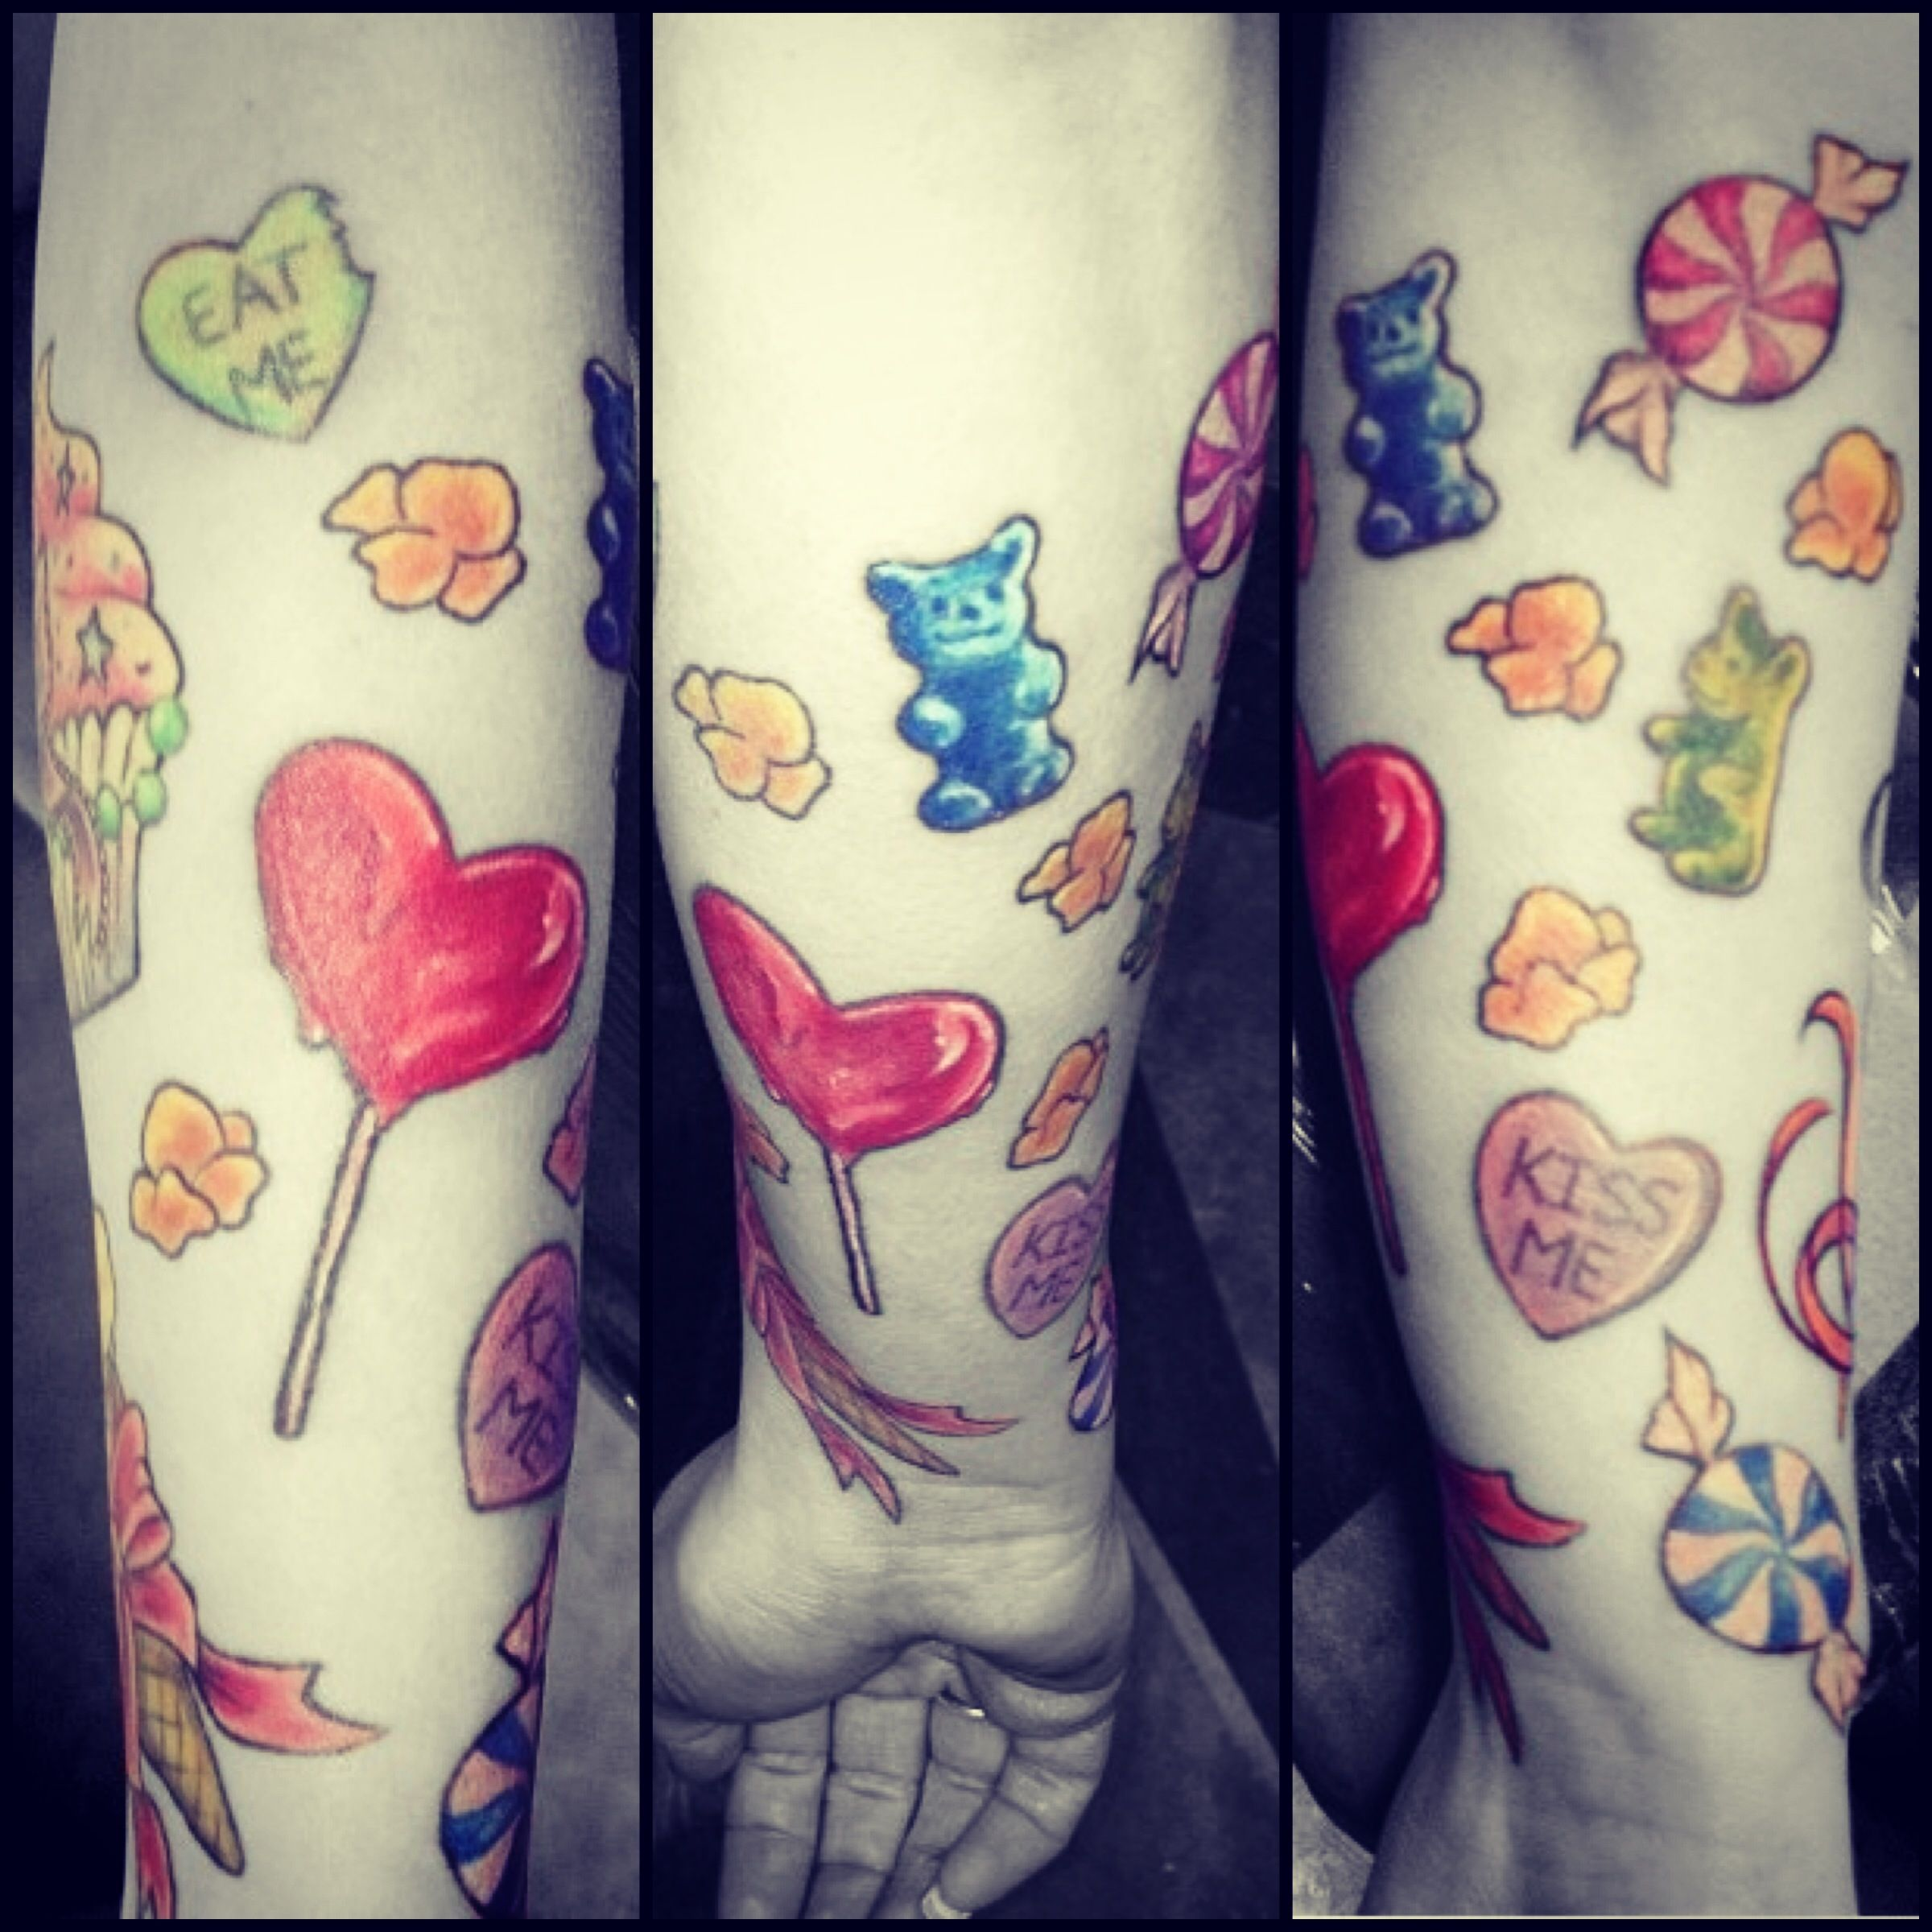 tattoos candy sleeve colors my tattoo tattoos pinterest tattoo and tatting. Black Bedroom Furniture Sets. Home Design Ideas